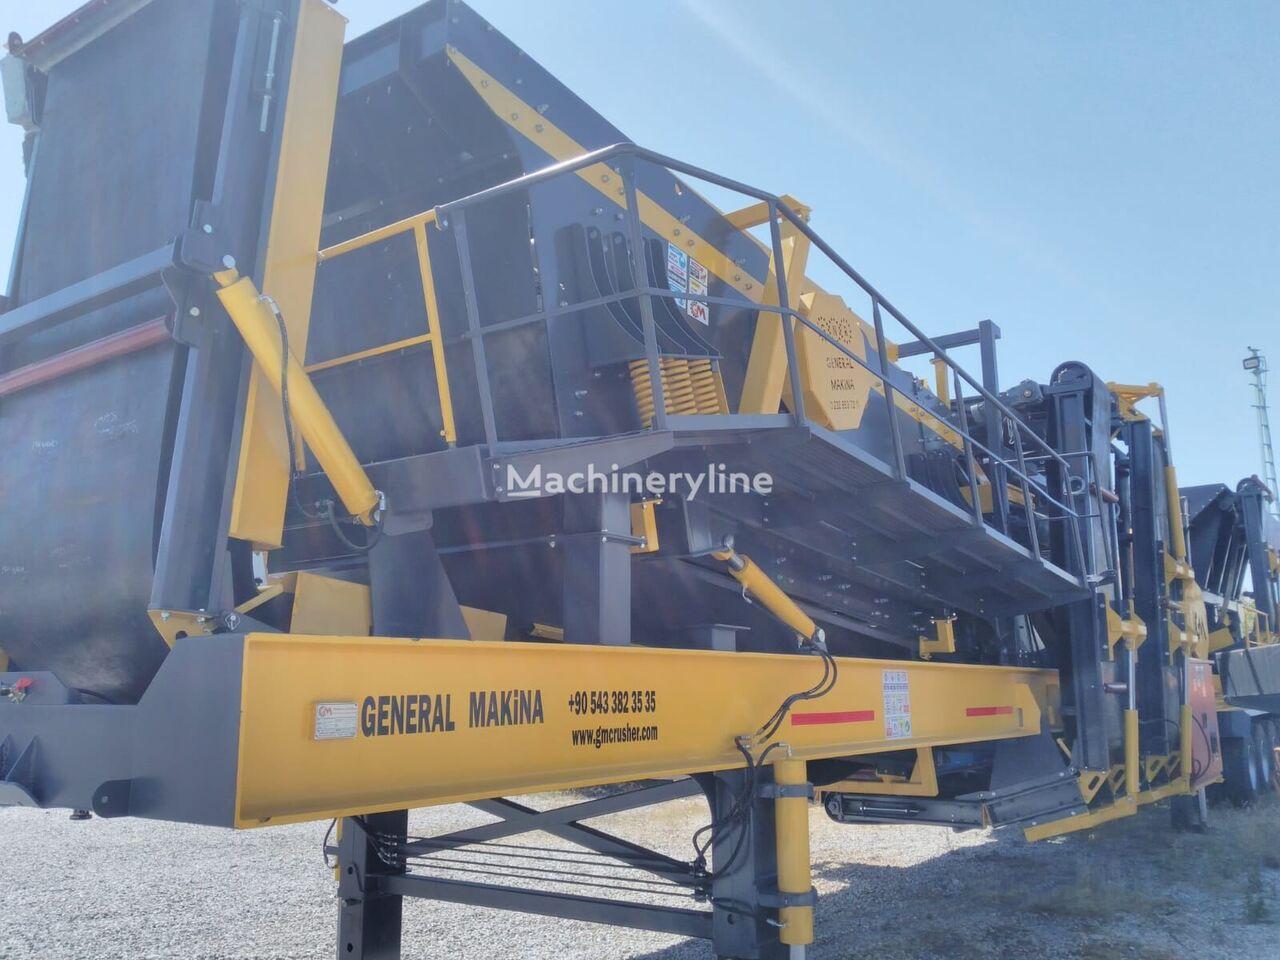 GENERAL MAKİNA General 02/Rotornaya 1250h1400 planta trituradora móvil nueva